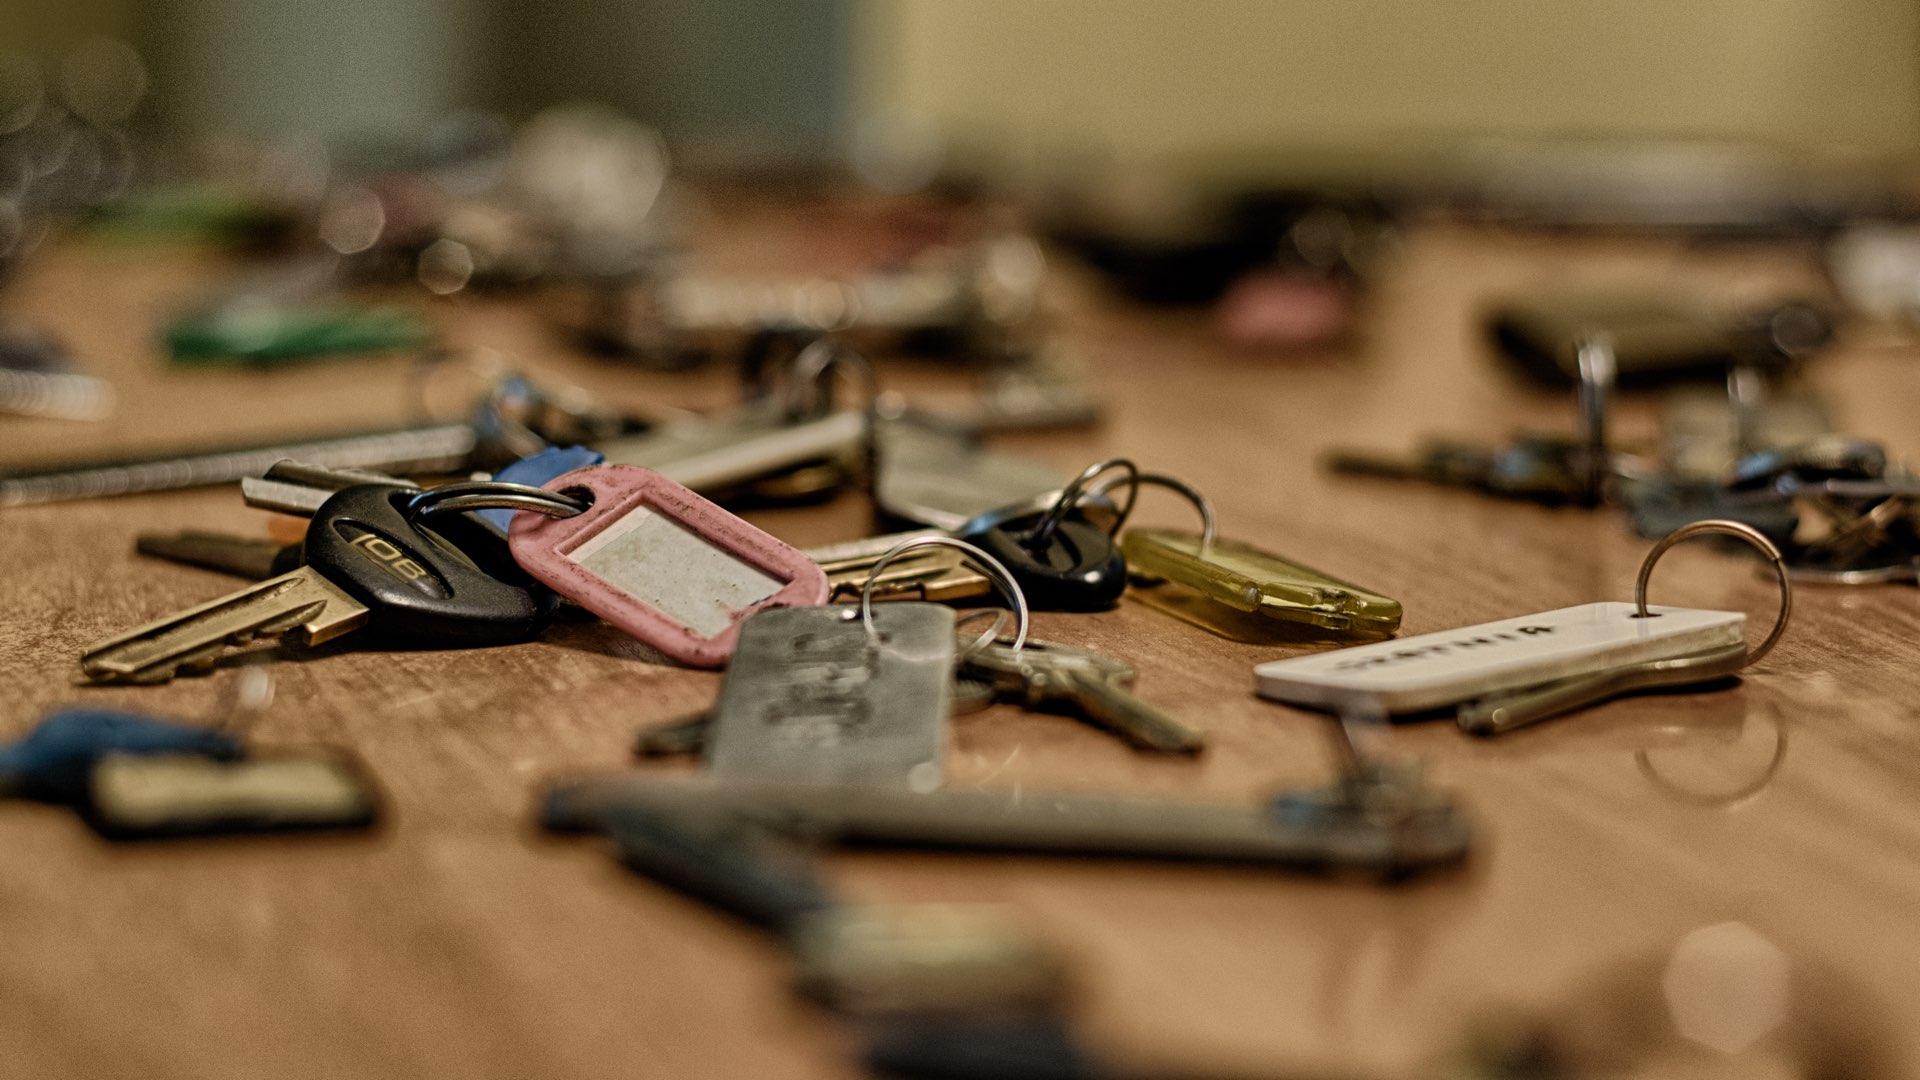 Locksmith services by K and L Locksmith